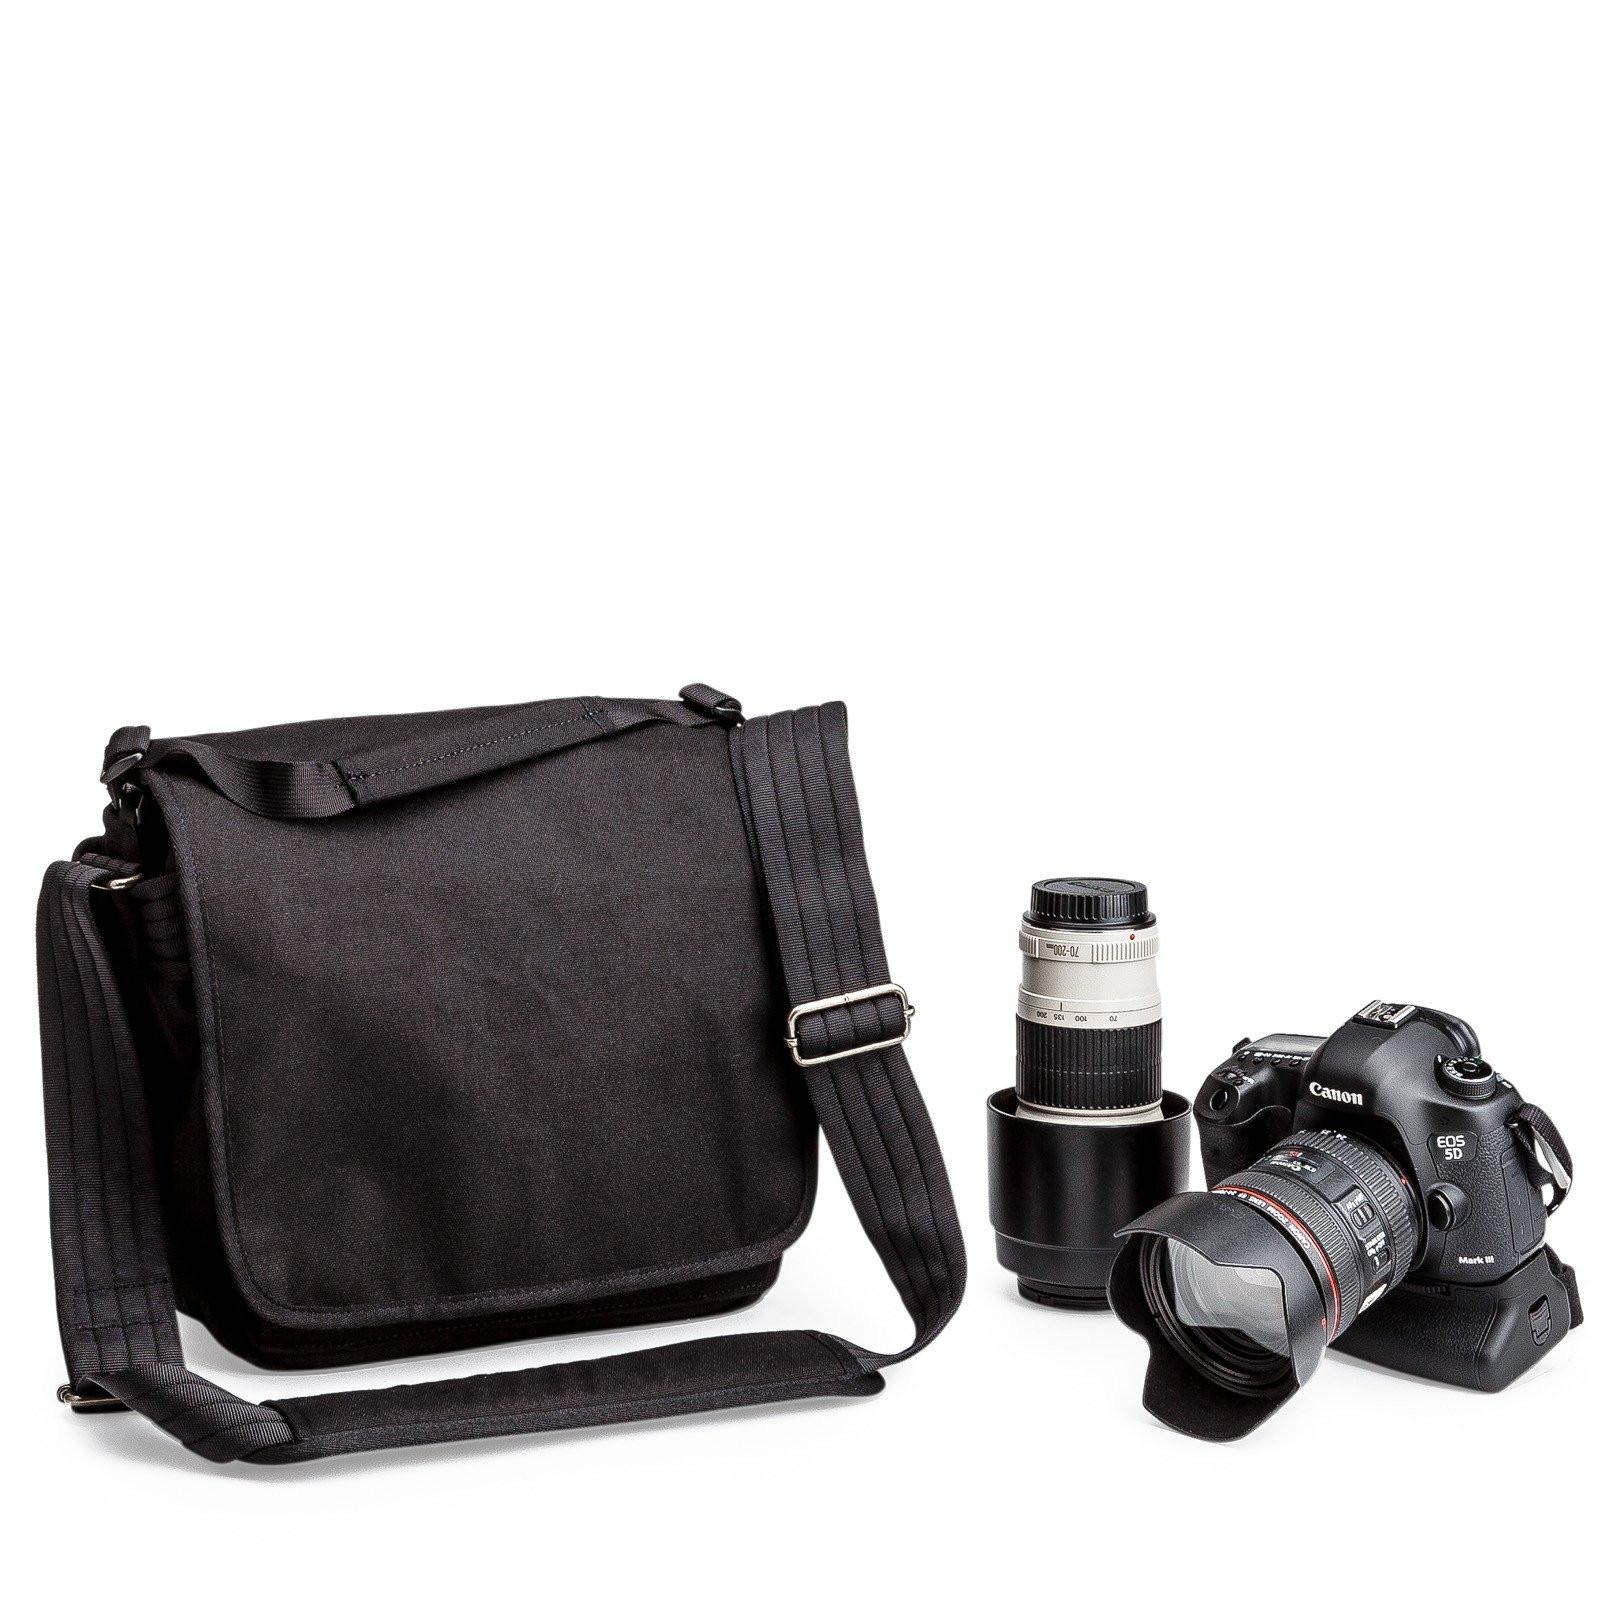 Сумка для фотоаппарата Think Tank Retrospective 10 - Black